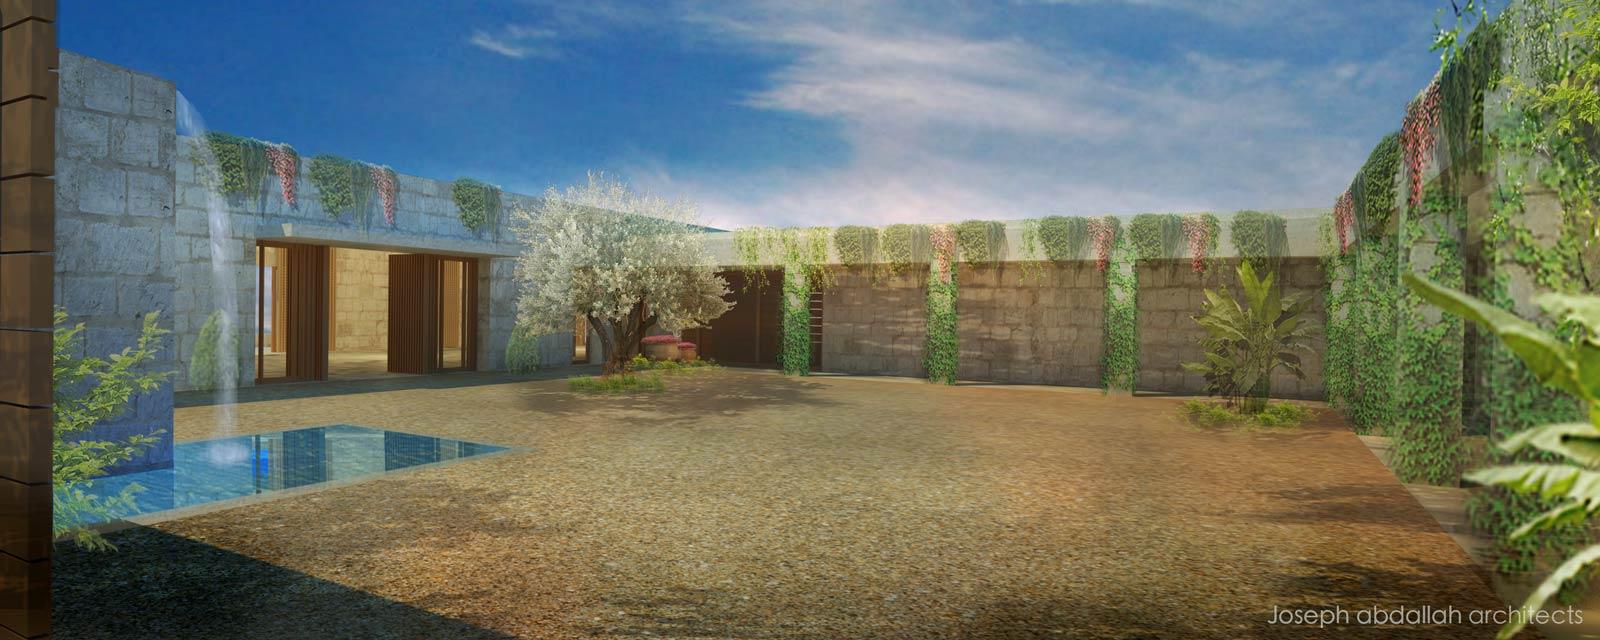 frangieh-sleiman-basel-villa-architecture-landscape-bnache-lebanon-joseph-abdallah-architects-2